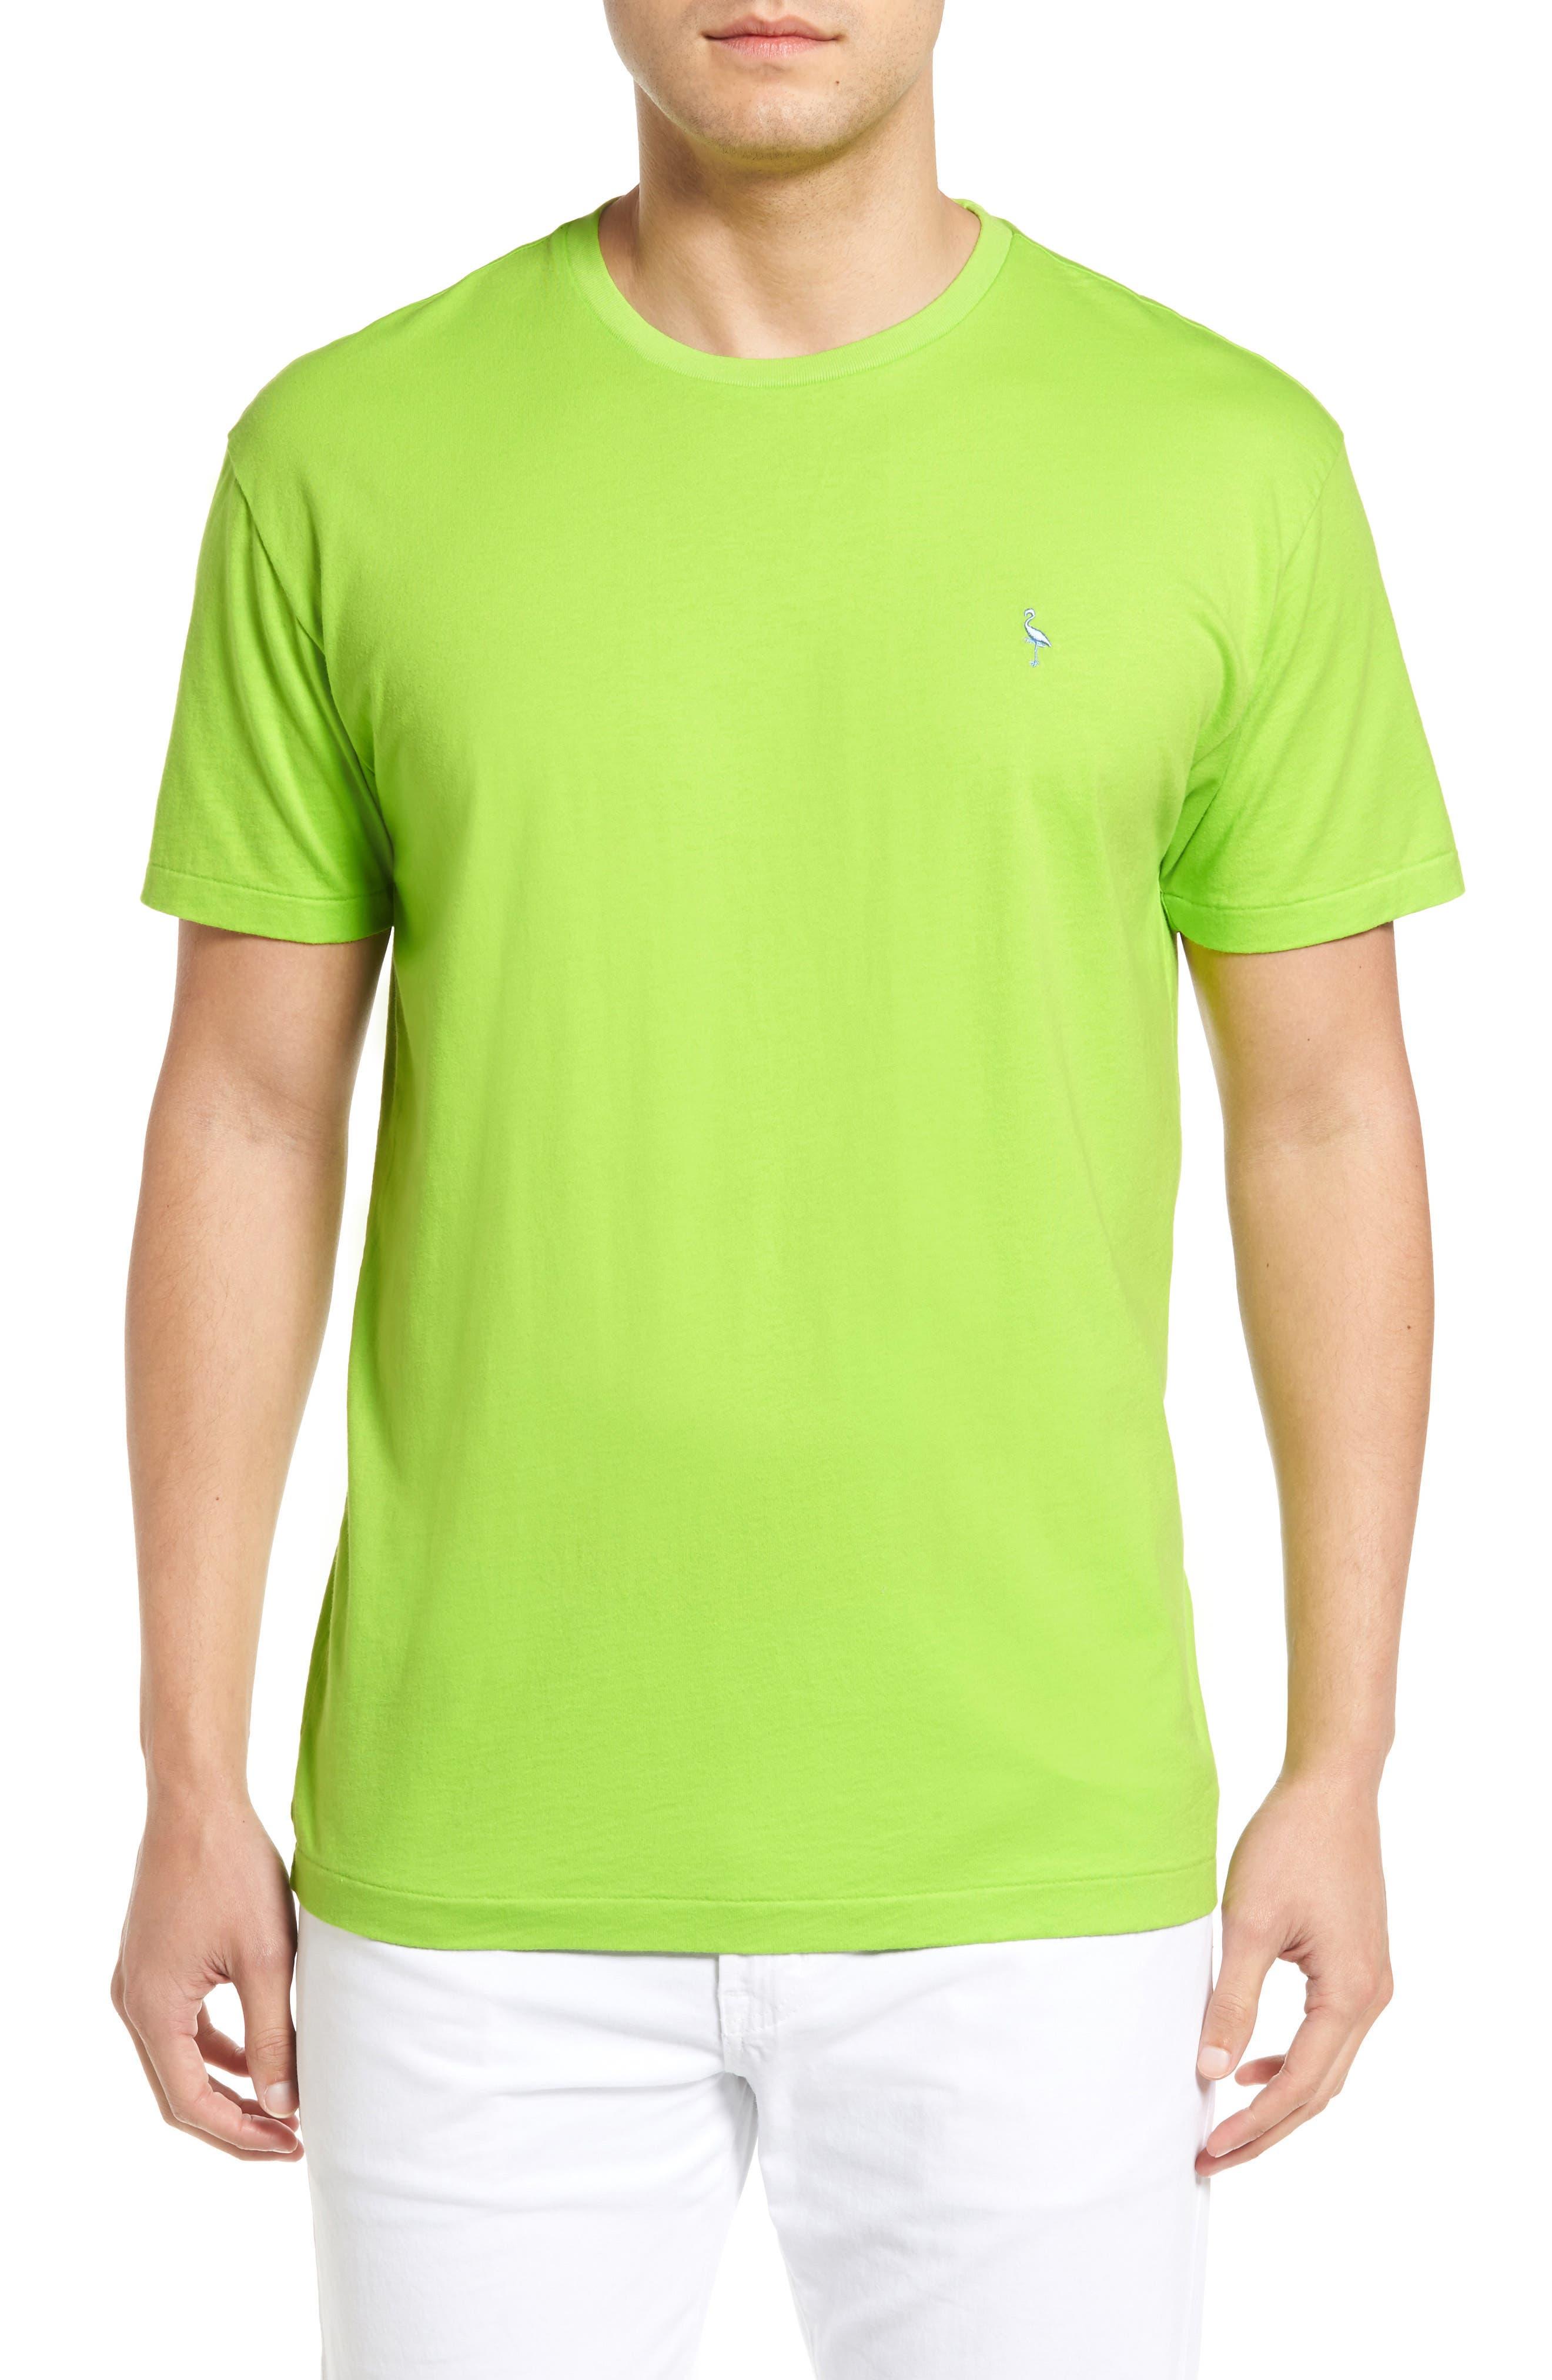 Main Image - TailorByrd Markham Square T-Shirt